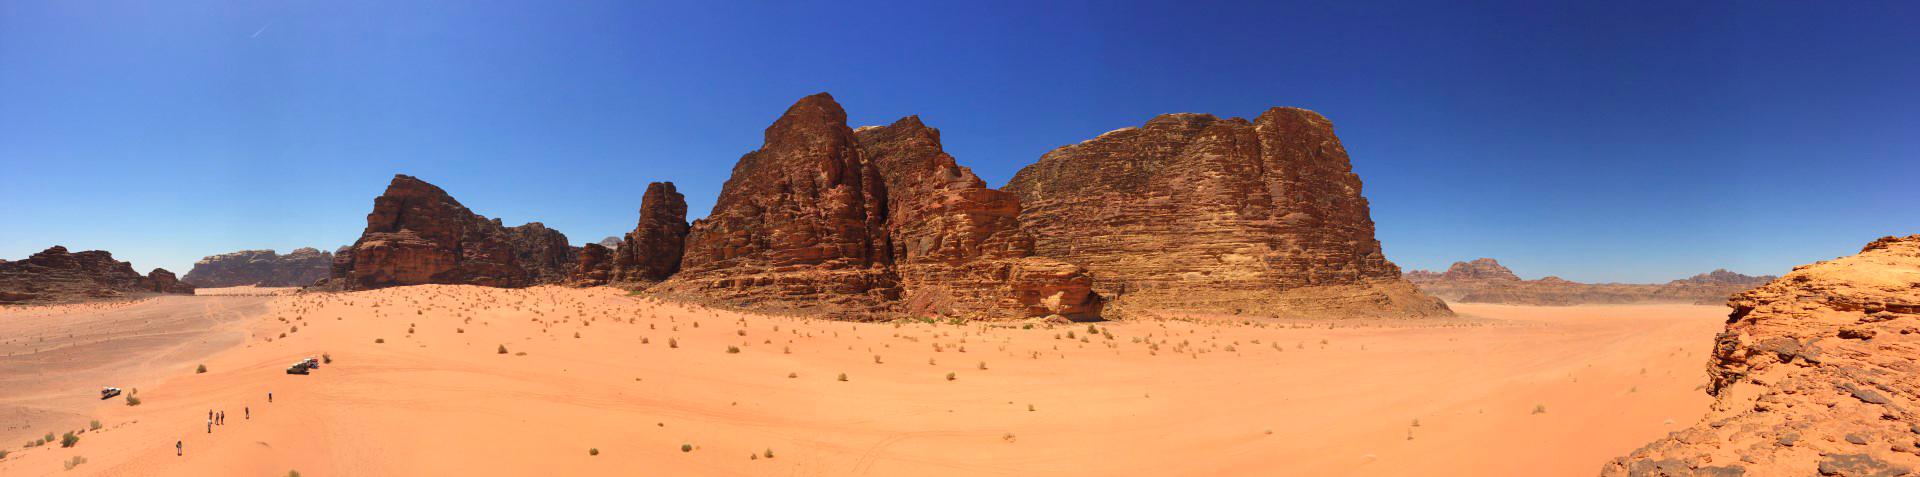 Qué ver en Wadi Rum: Desierto de Wadi Rum en Jordania qué ver en wadi rum - 27672819144 f74446f686 o - Qué ver en Wadi Rum, Jordania